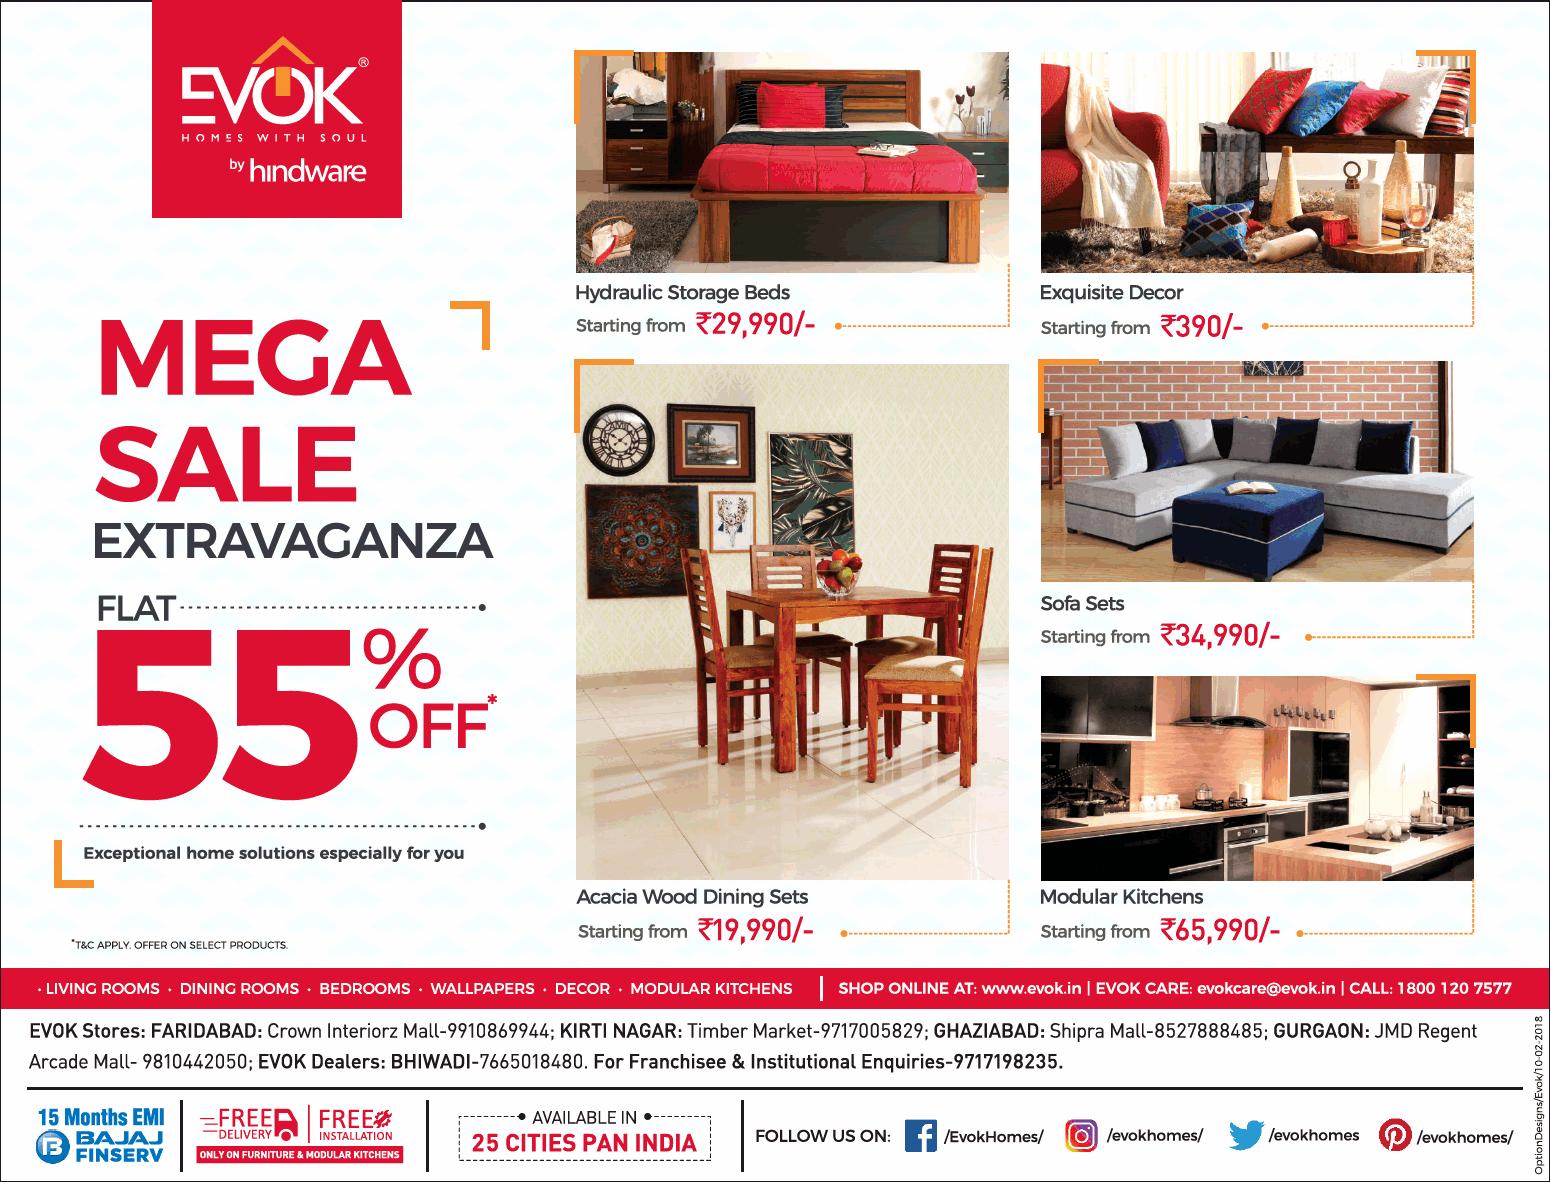 Furniture sale advertisement Weekly Evok Furniture Mega Sale Advert Gallery Evok Furniture Mega Sale Extravaganza Flat 55 Off Ad Advert Gallery